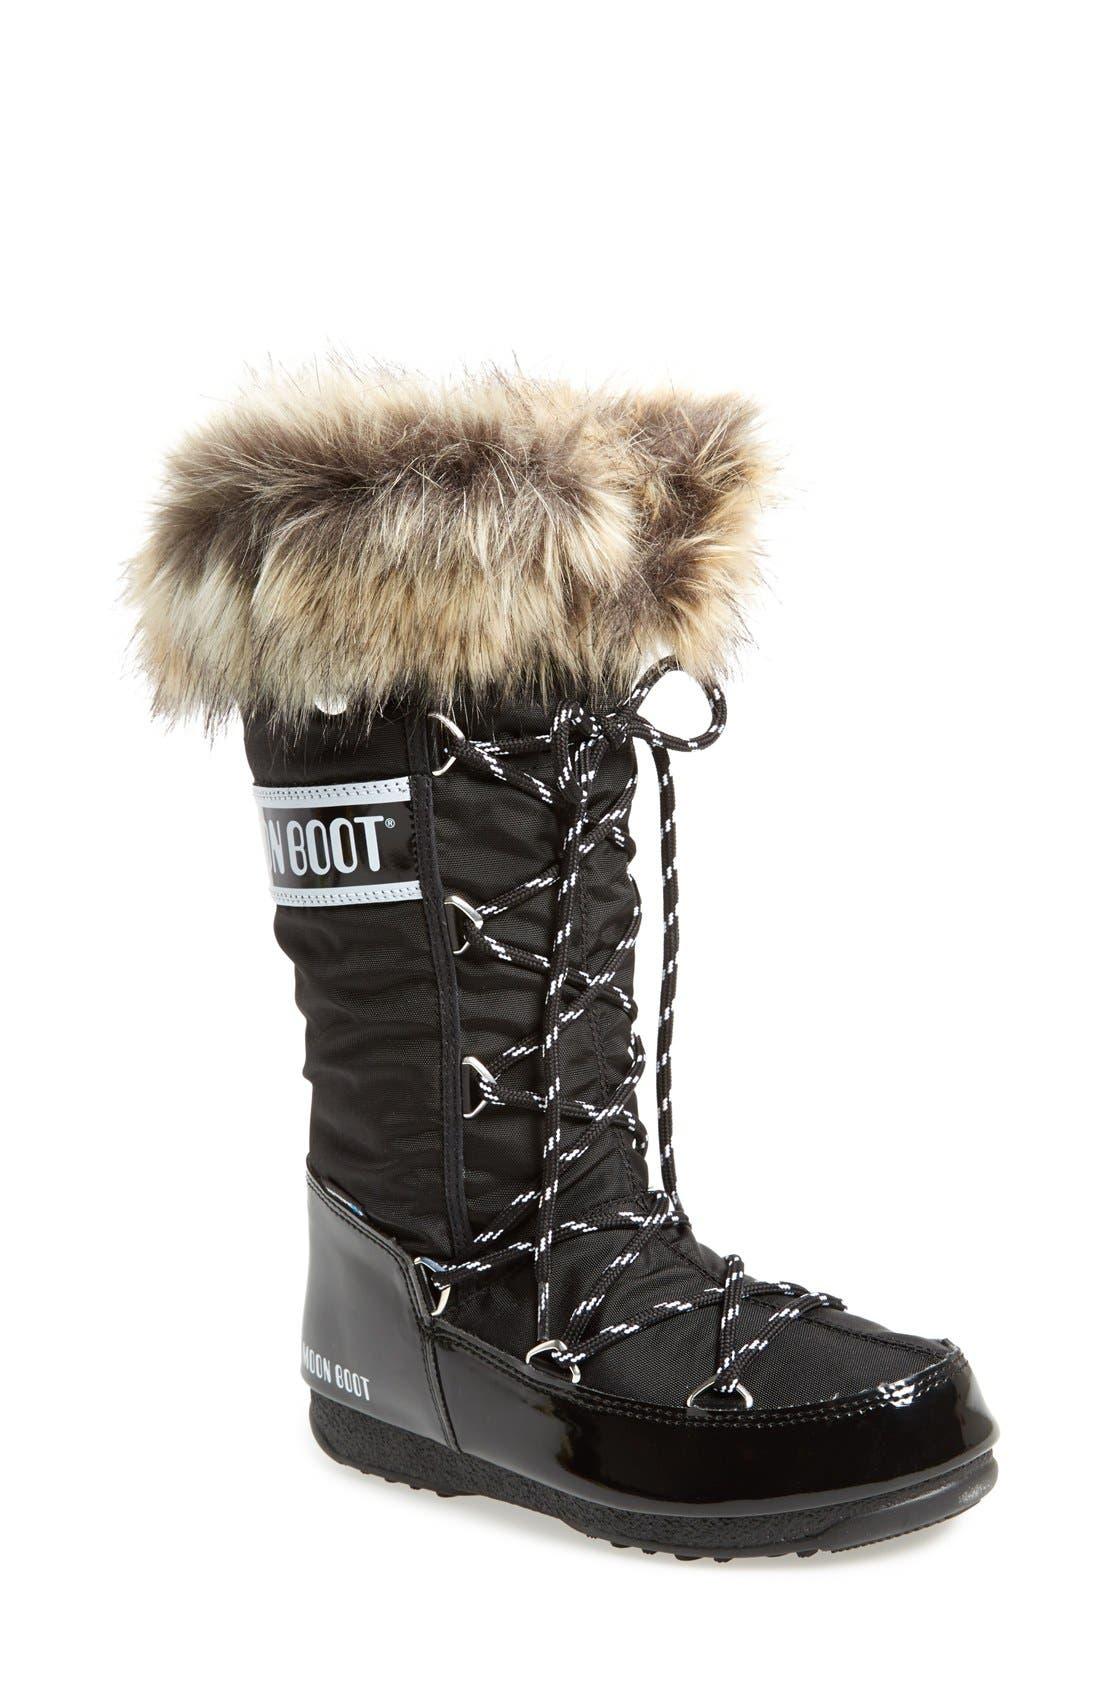 Main Image - Tecnica® 'Monaco' Waterproof Insulated Moon Boot® (Women)